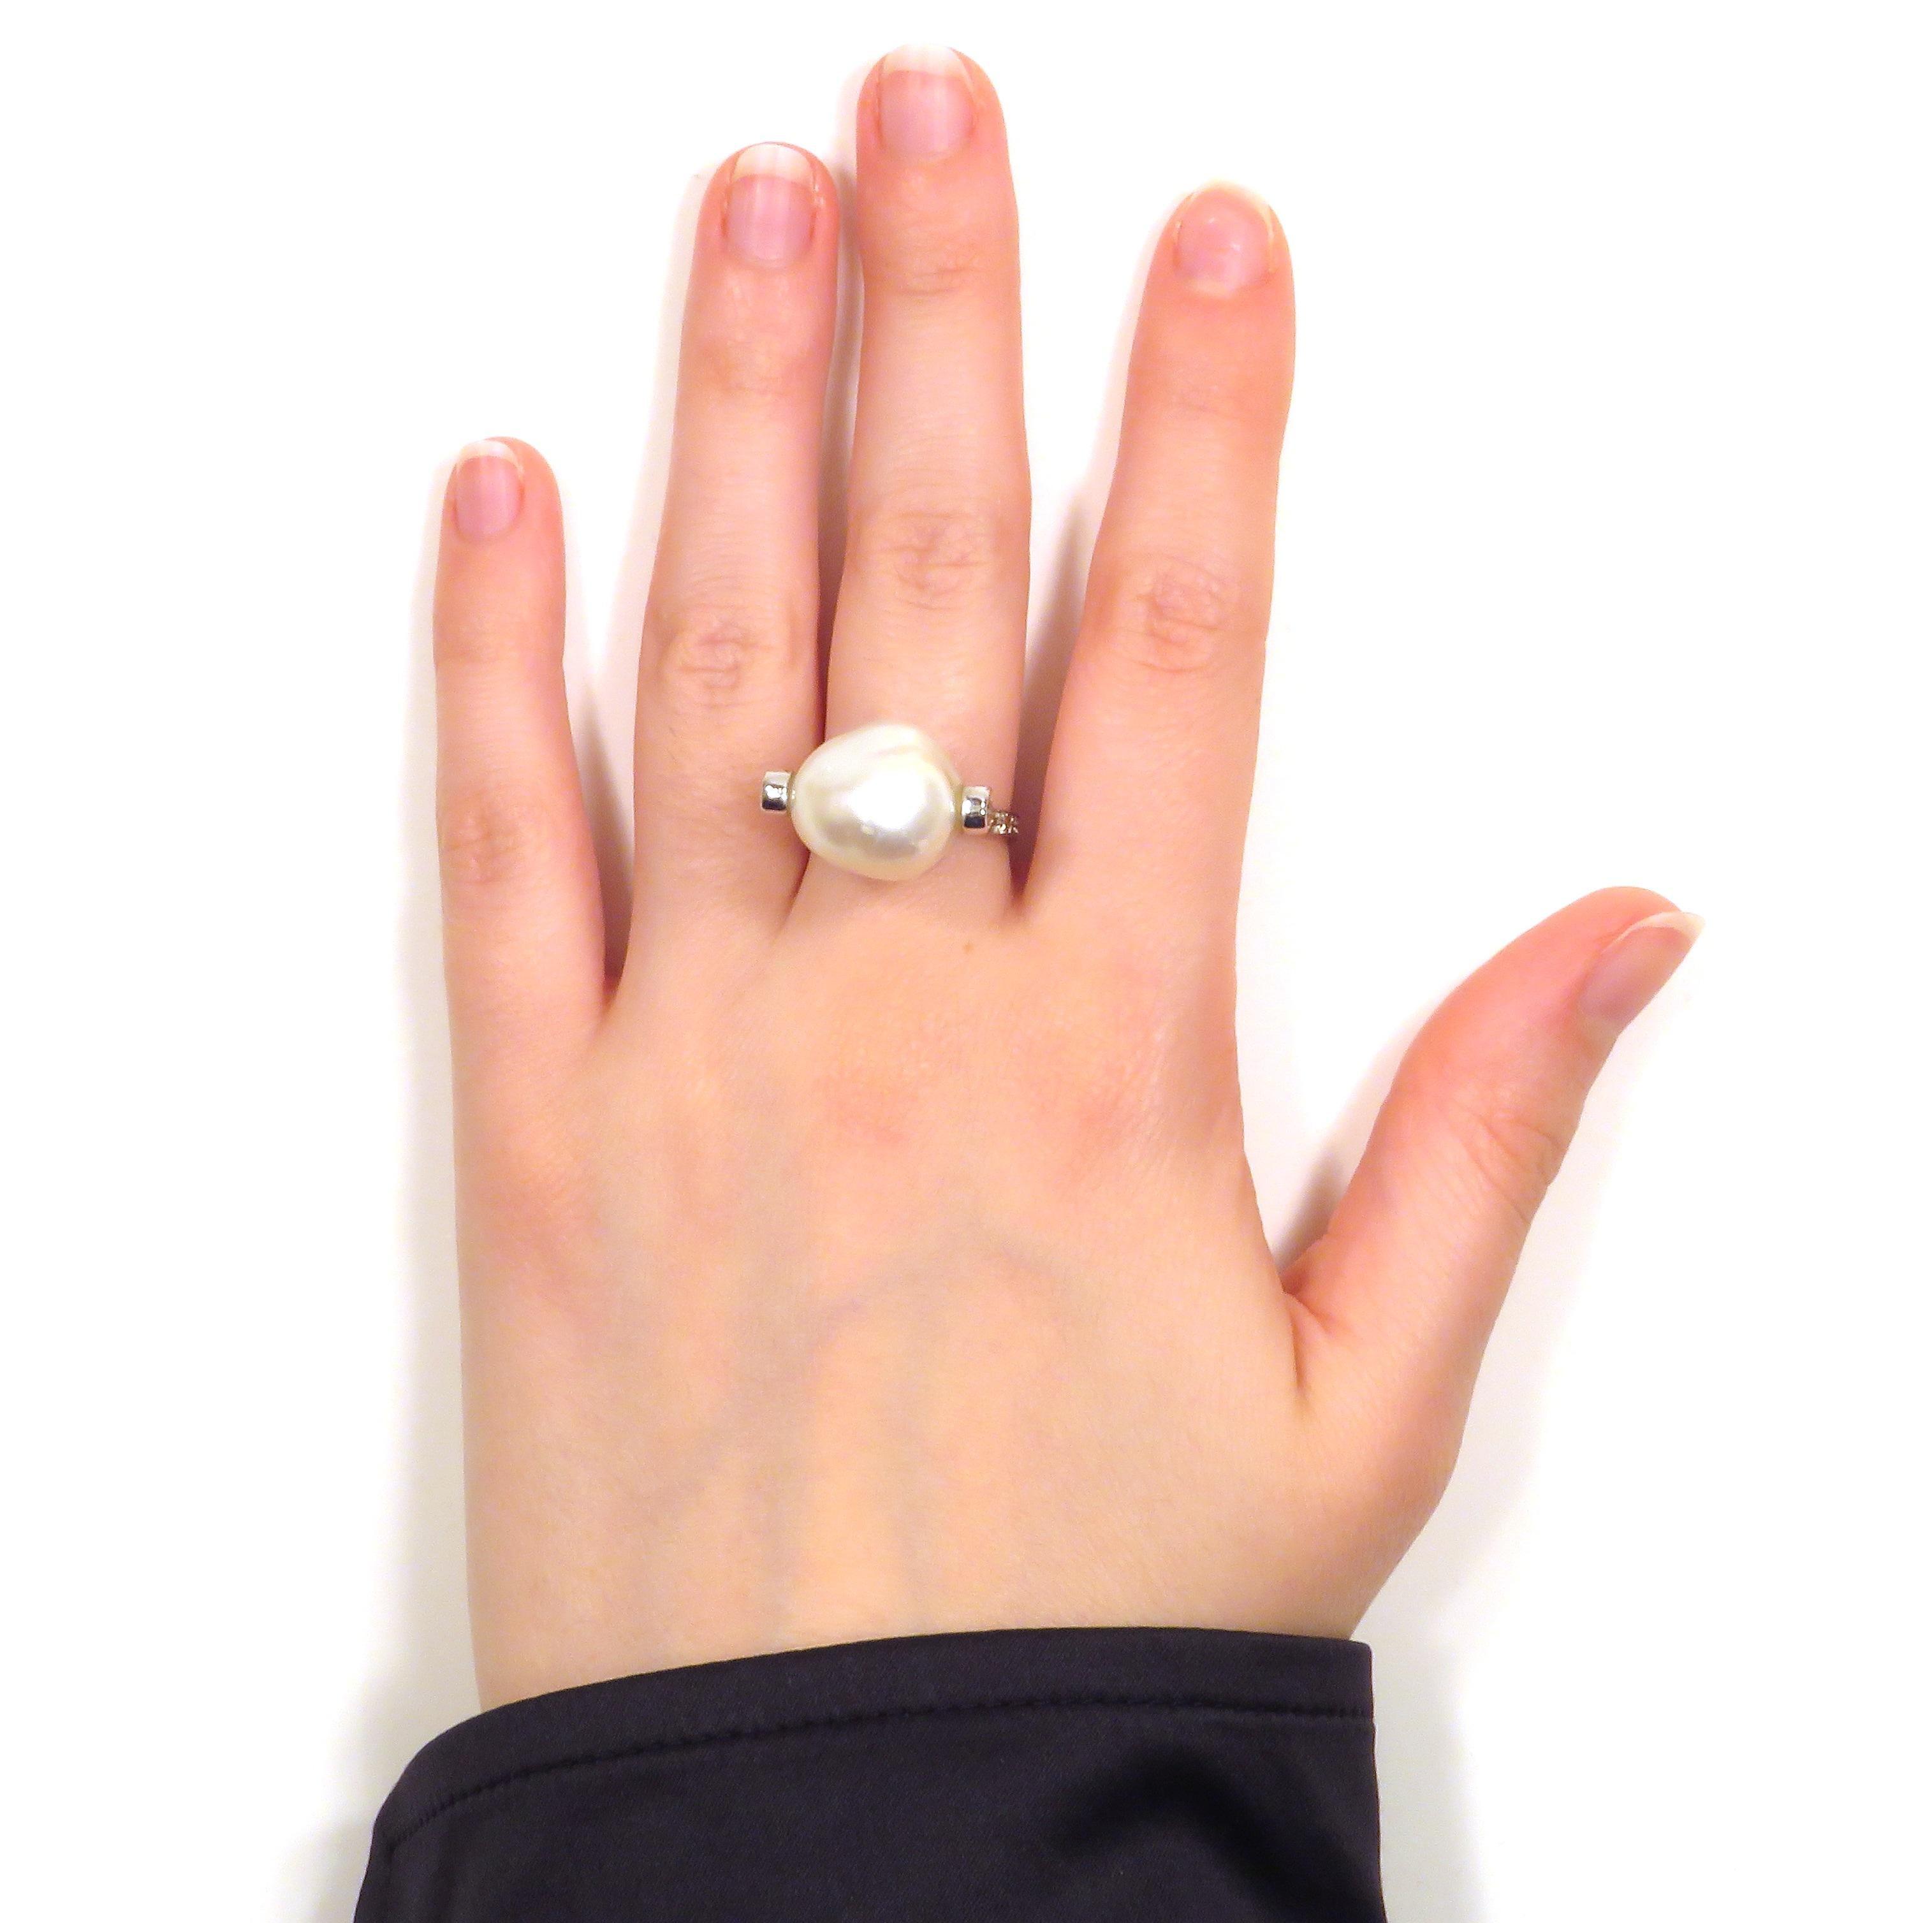 White Australian Pearl Diamonds 18 Karat White Gold Ring Handcrafted in  Italy